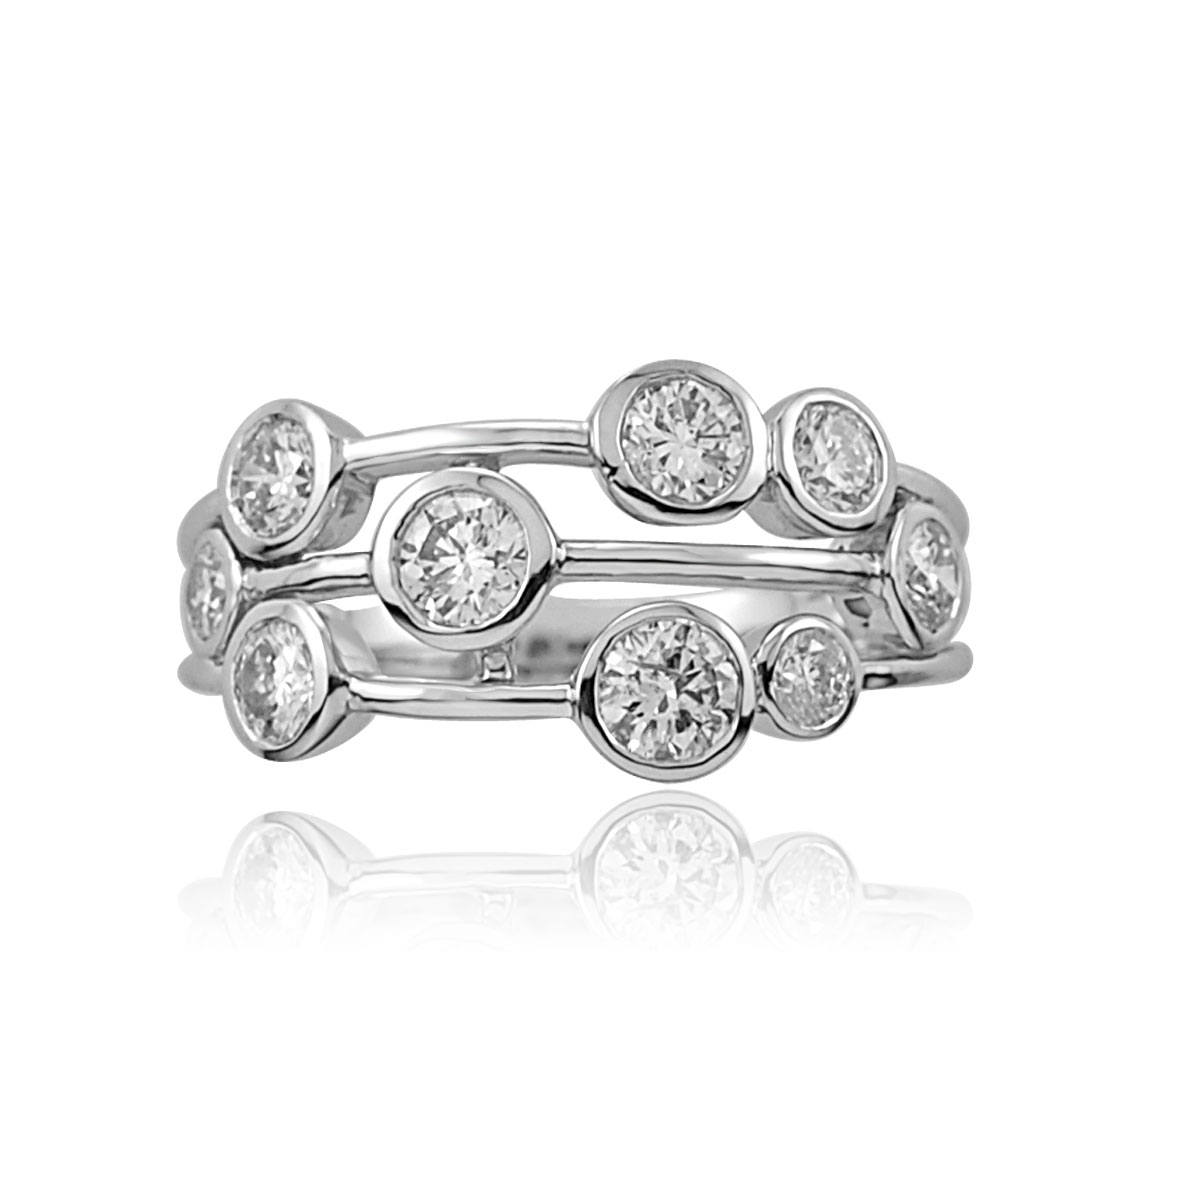 18ct White Gold Scatter Design Dress Ring